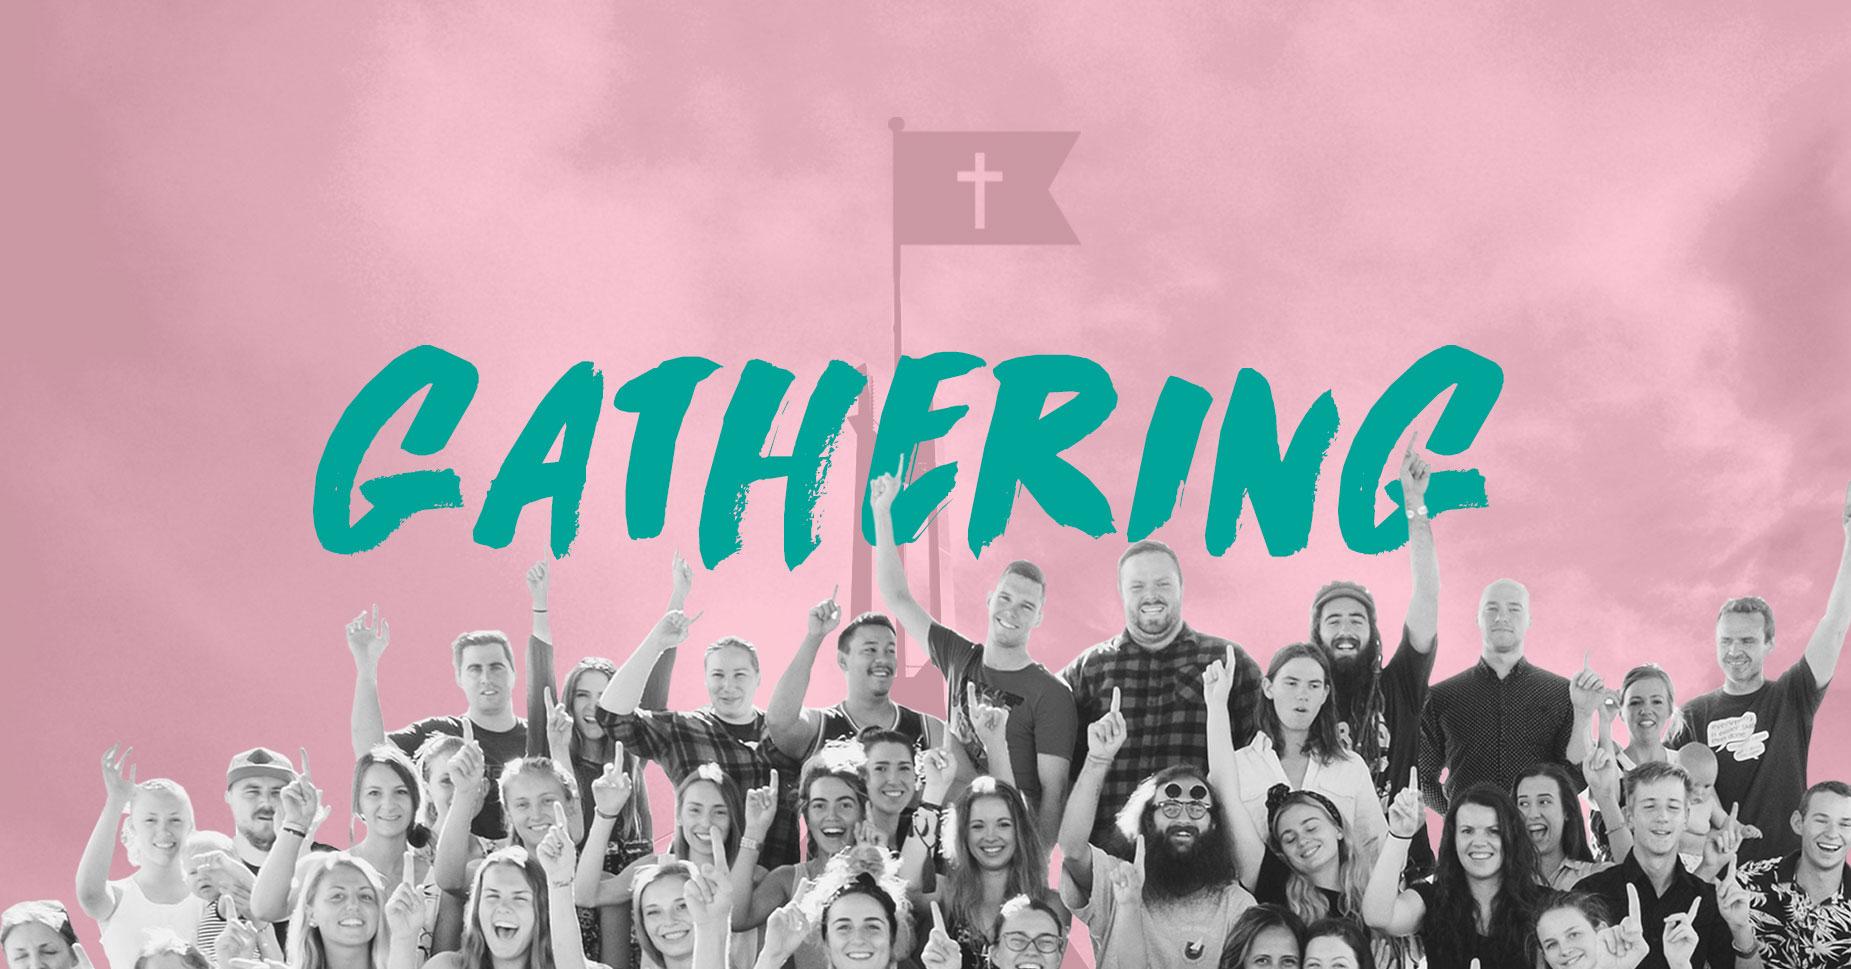 National Gathering 2020